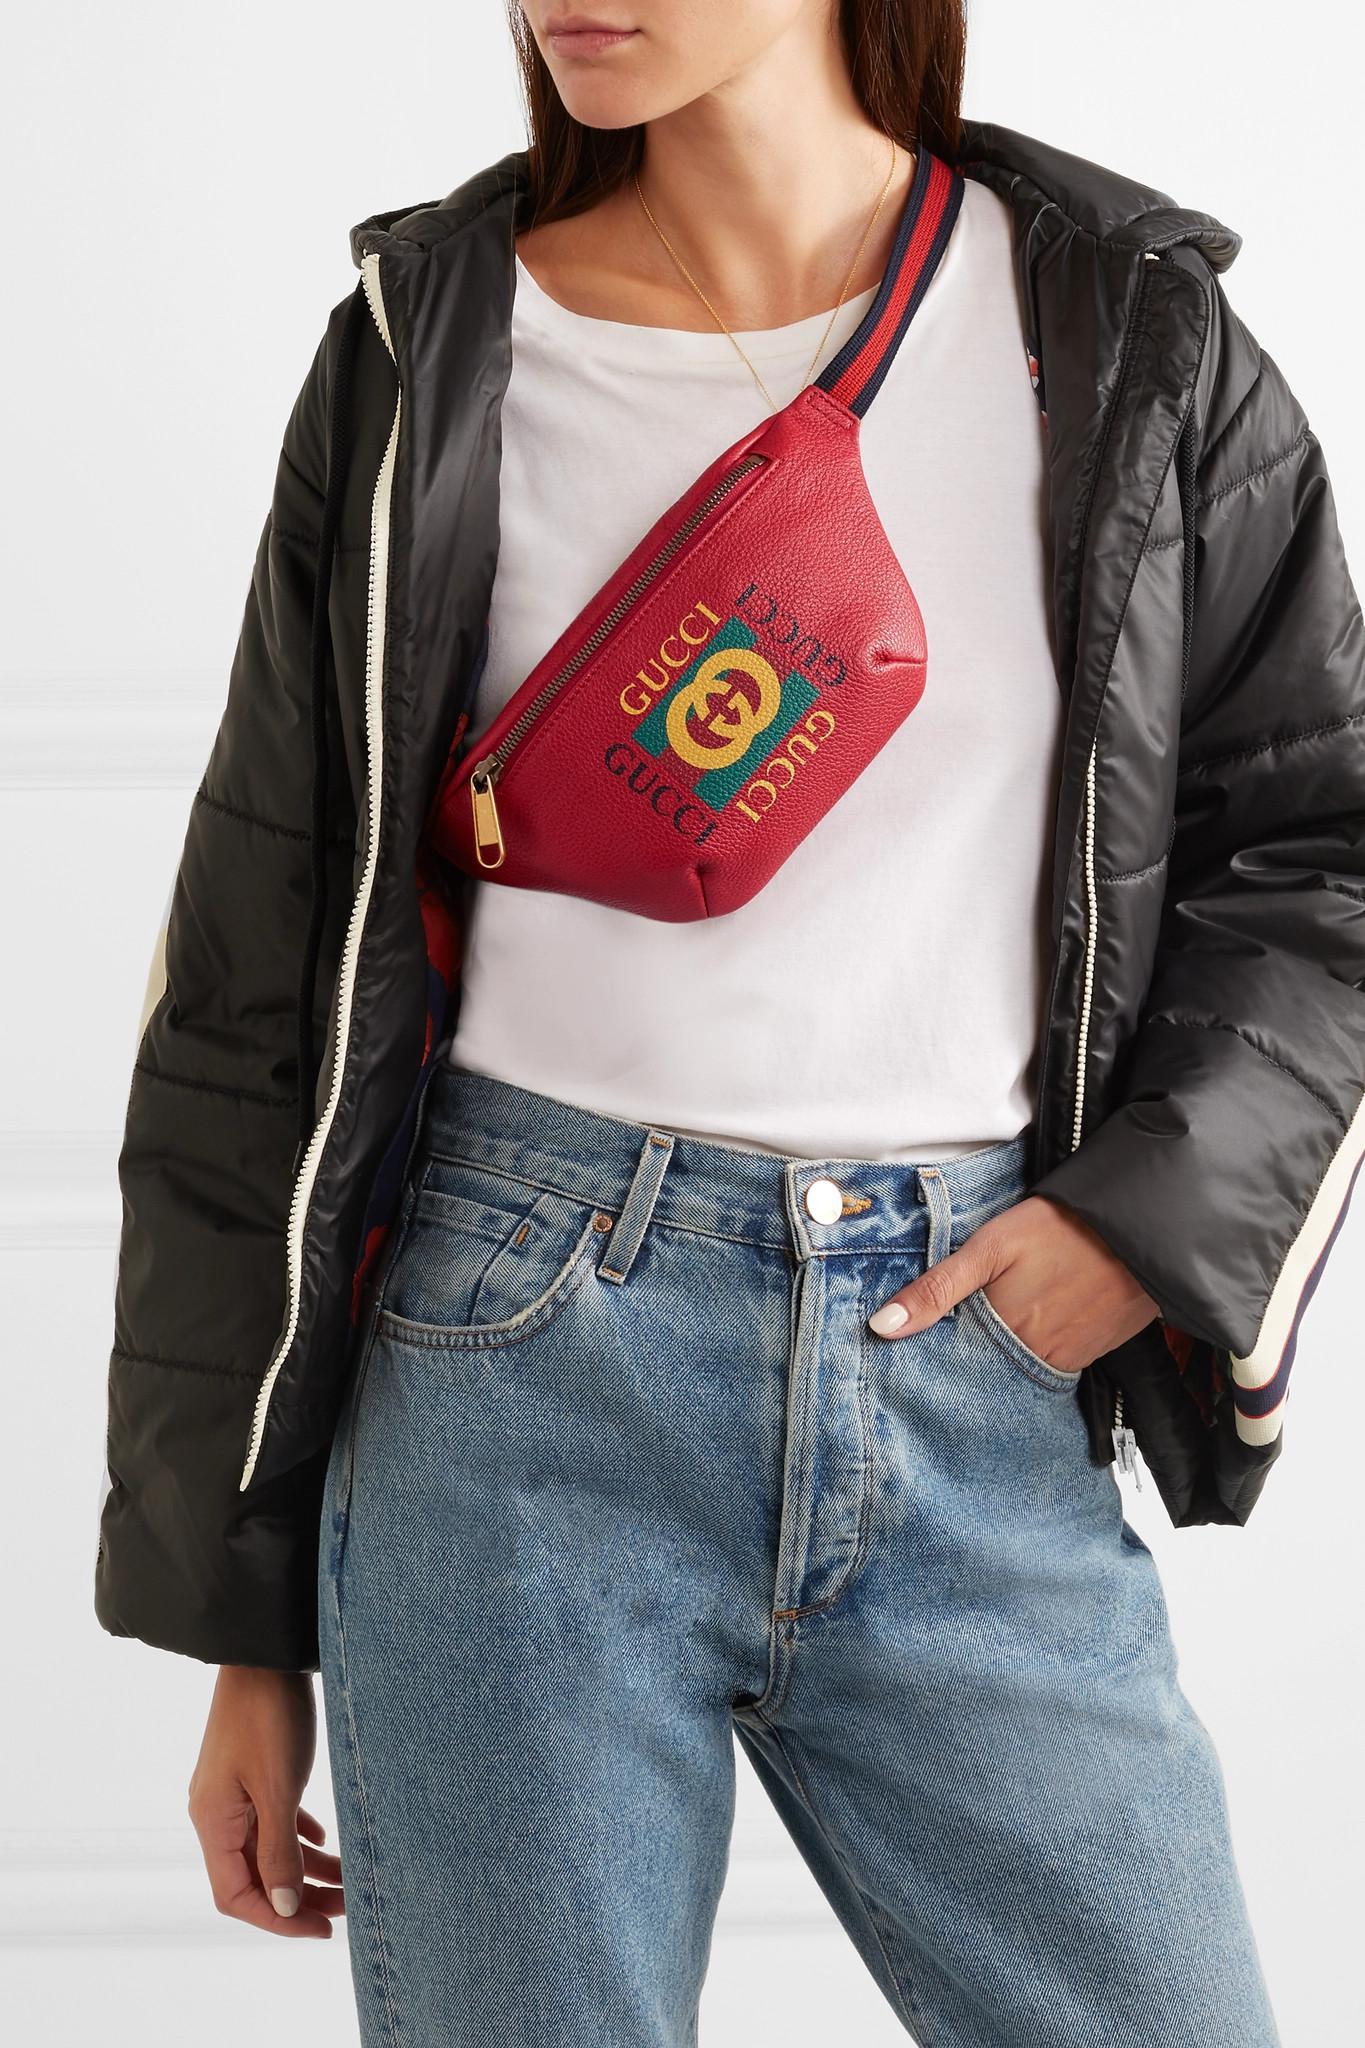 27444b00fd96 Gucci Black Guccissima Leather Belt Size 95CM. View fullscreen